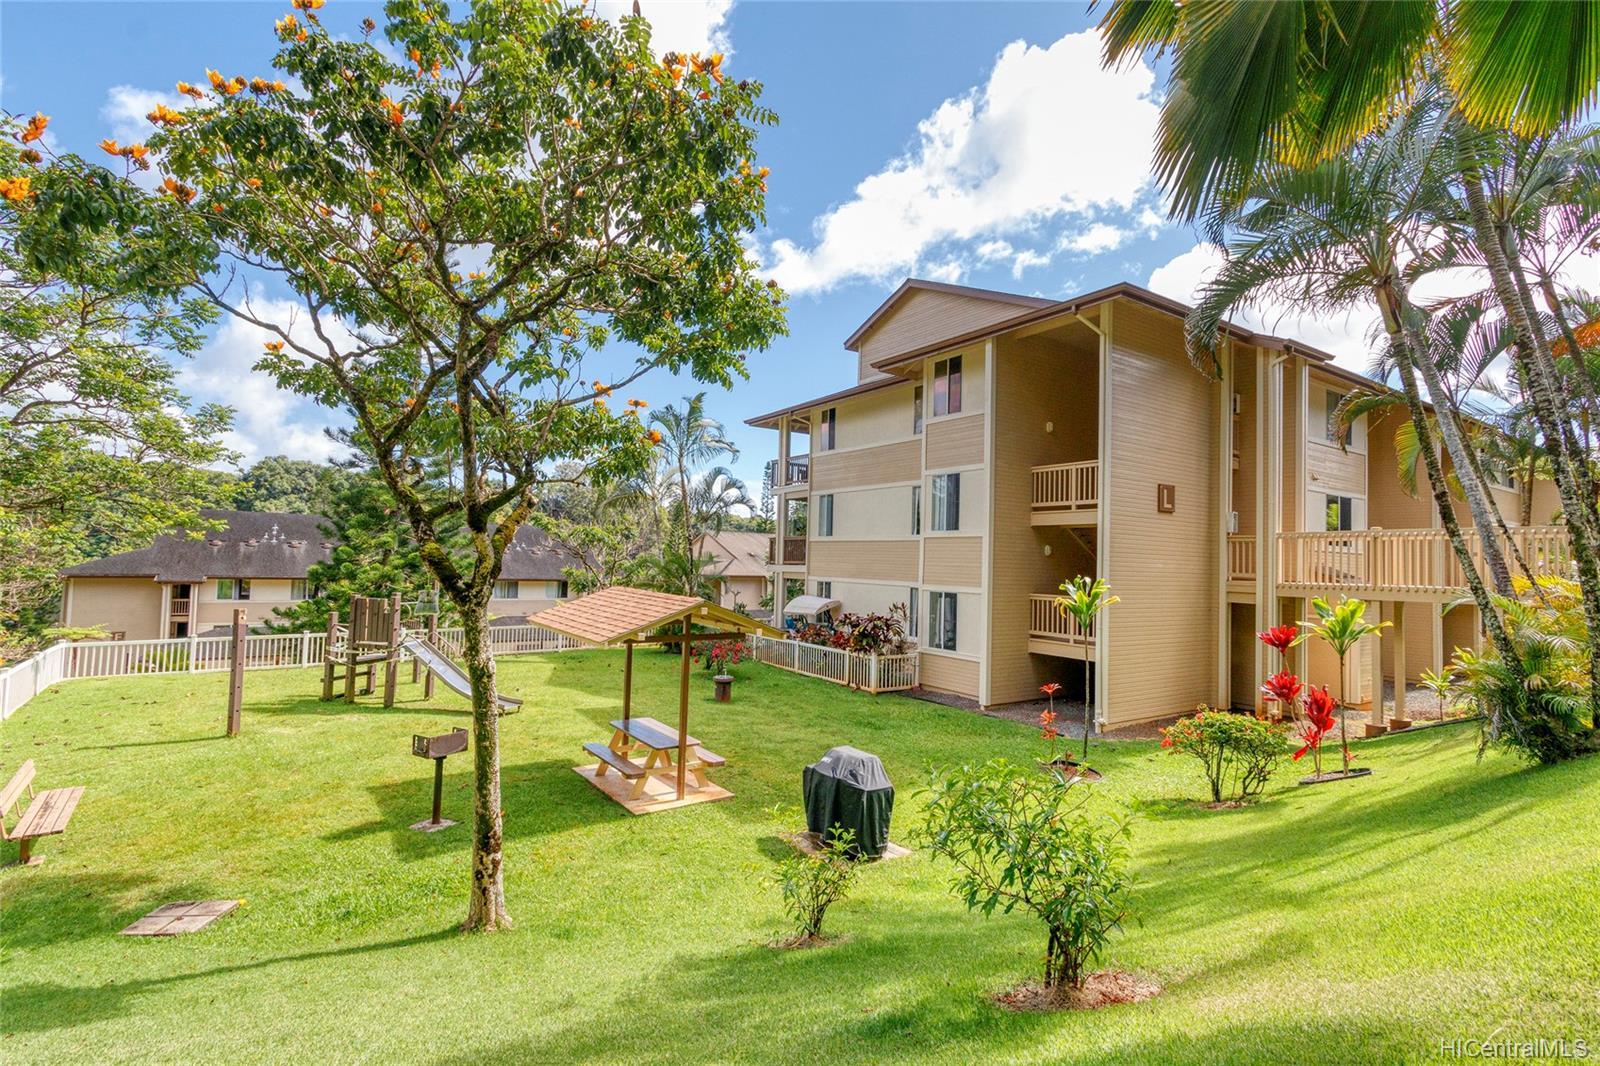 95-982 Wikao Street townhouse # L102, Mililani, Hawaii - photo 16 of 23